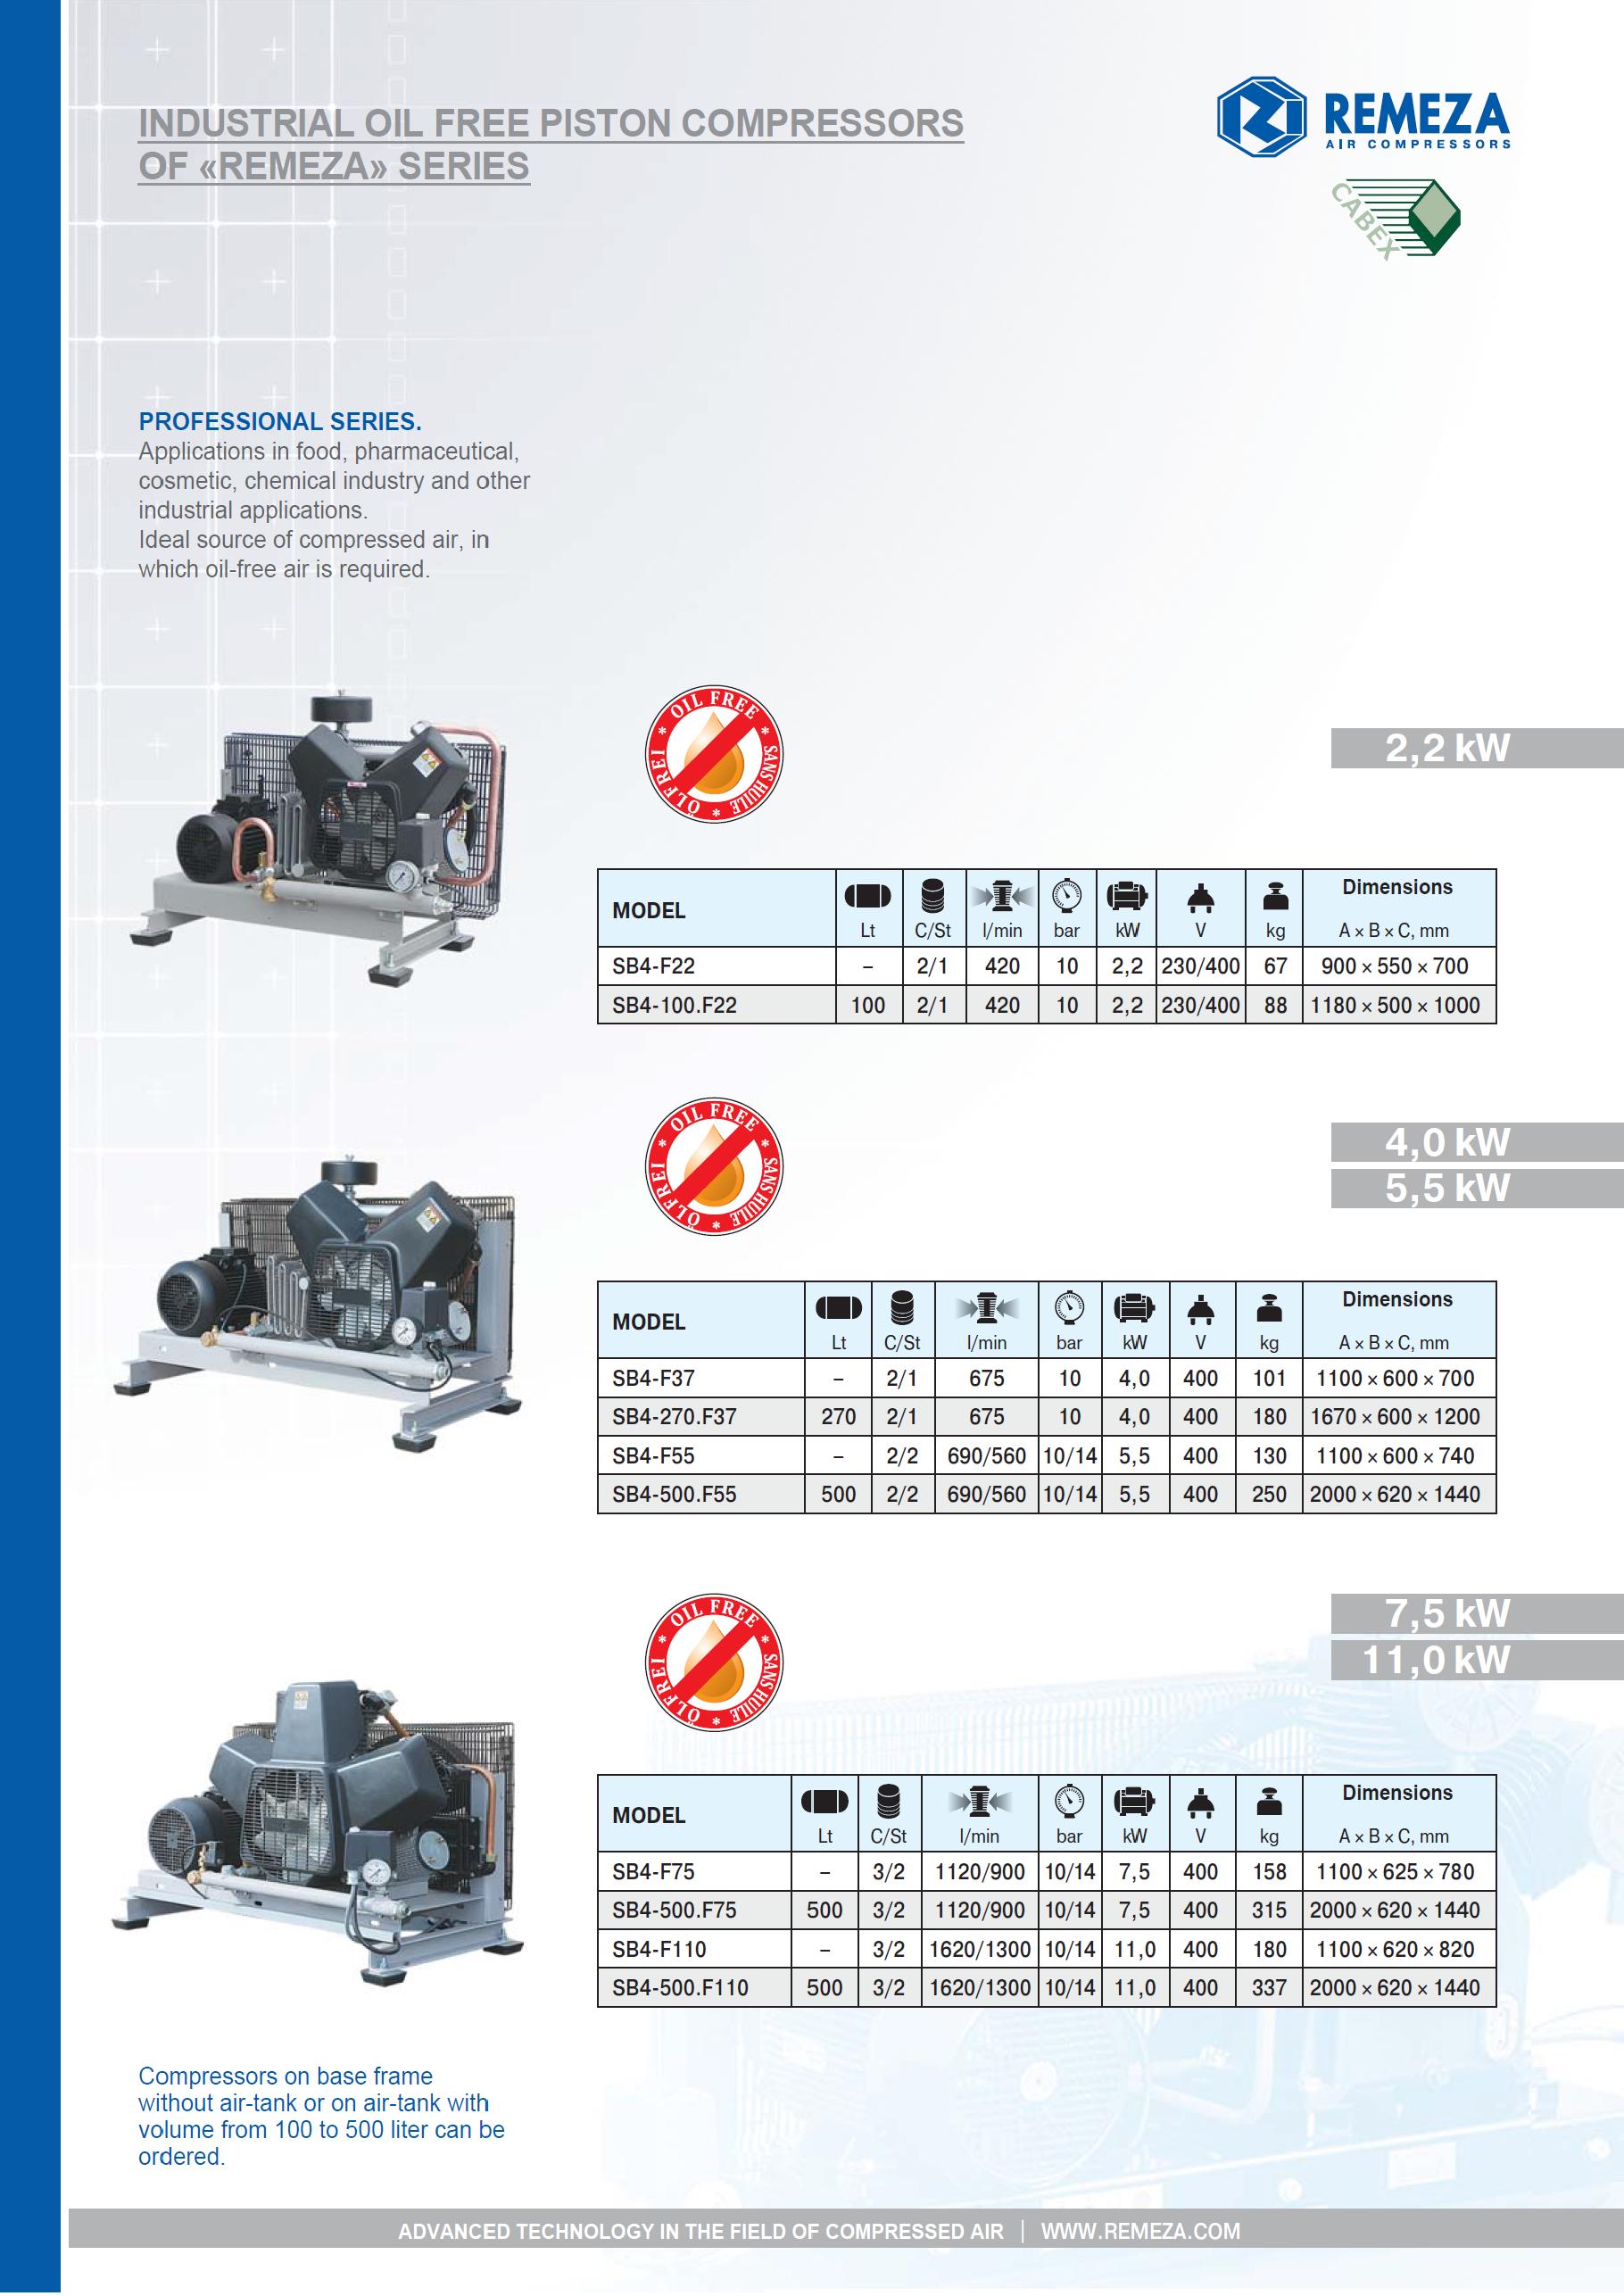 6_industrial-olil-free-piston-compressors-remeza-series_pag_1